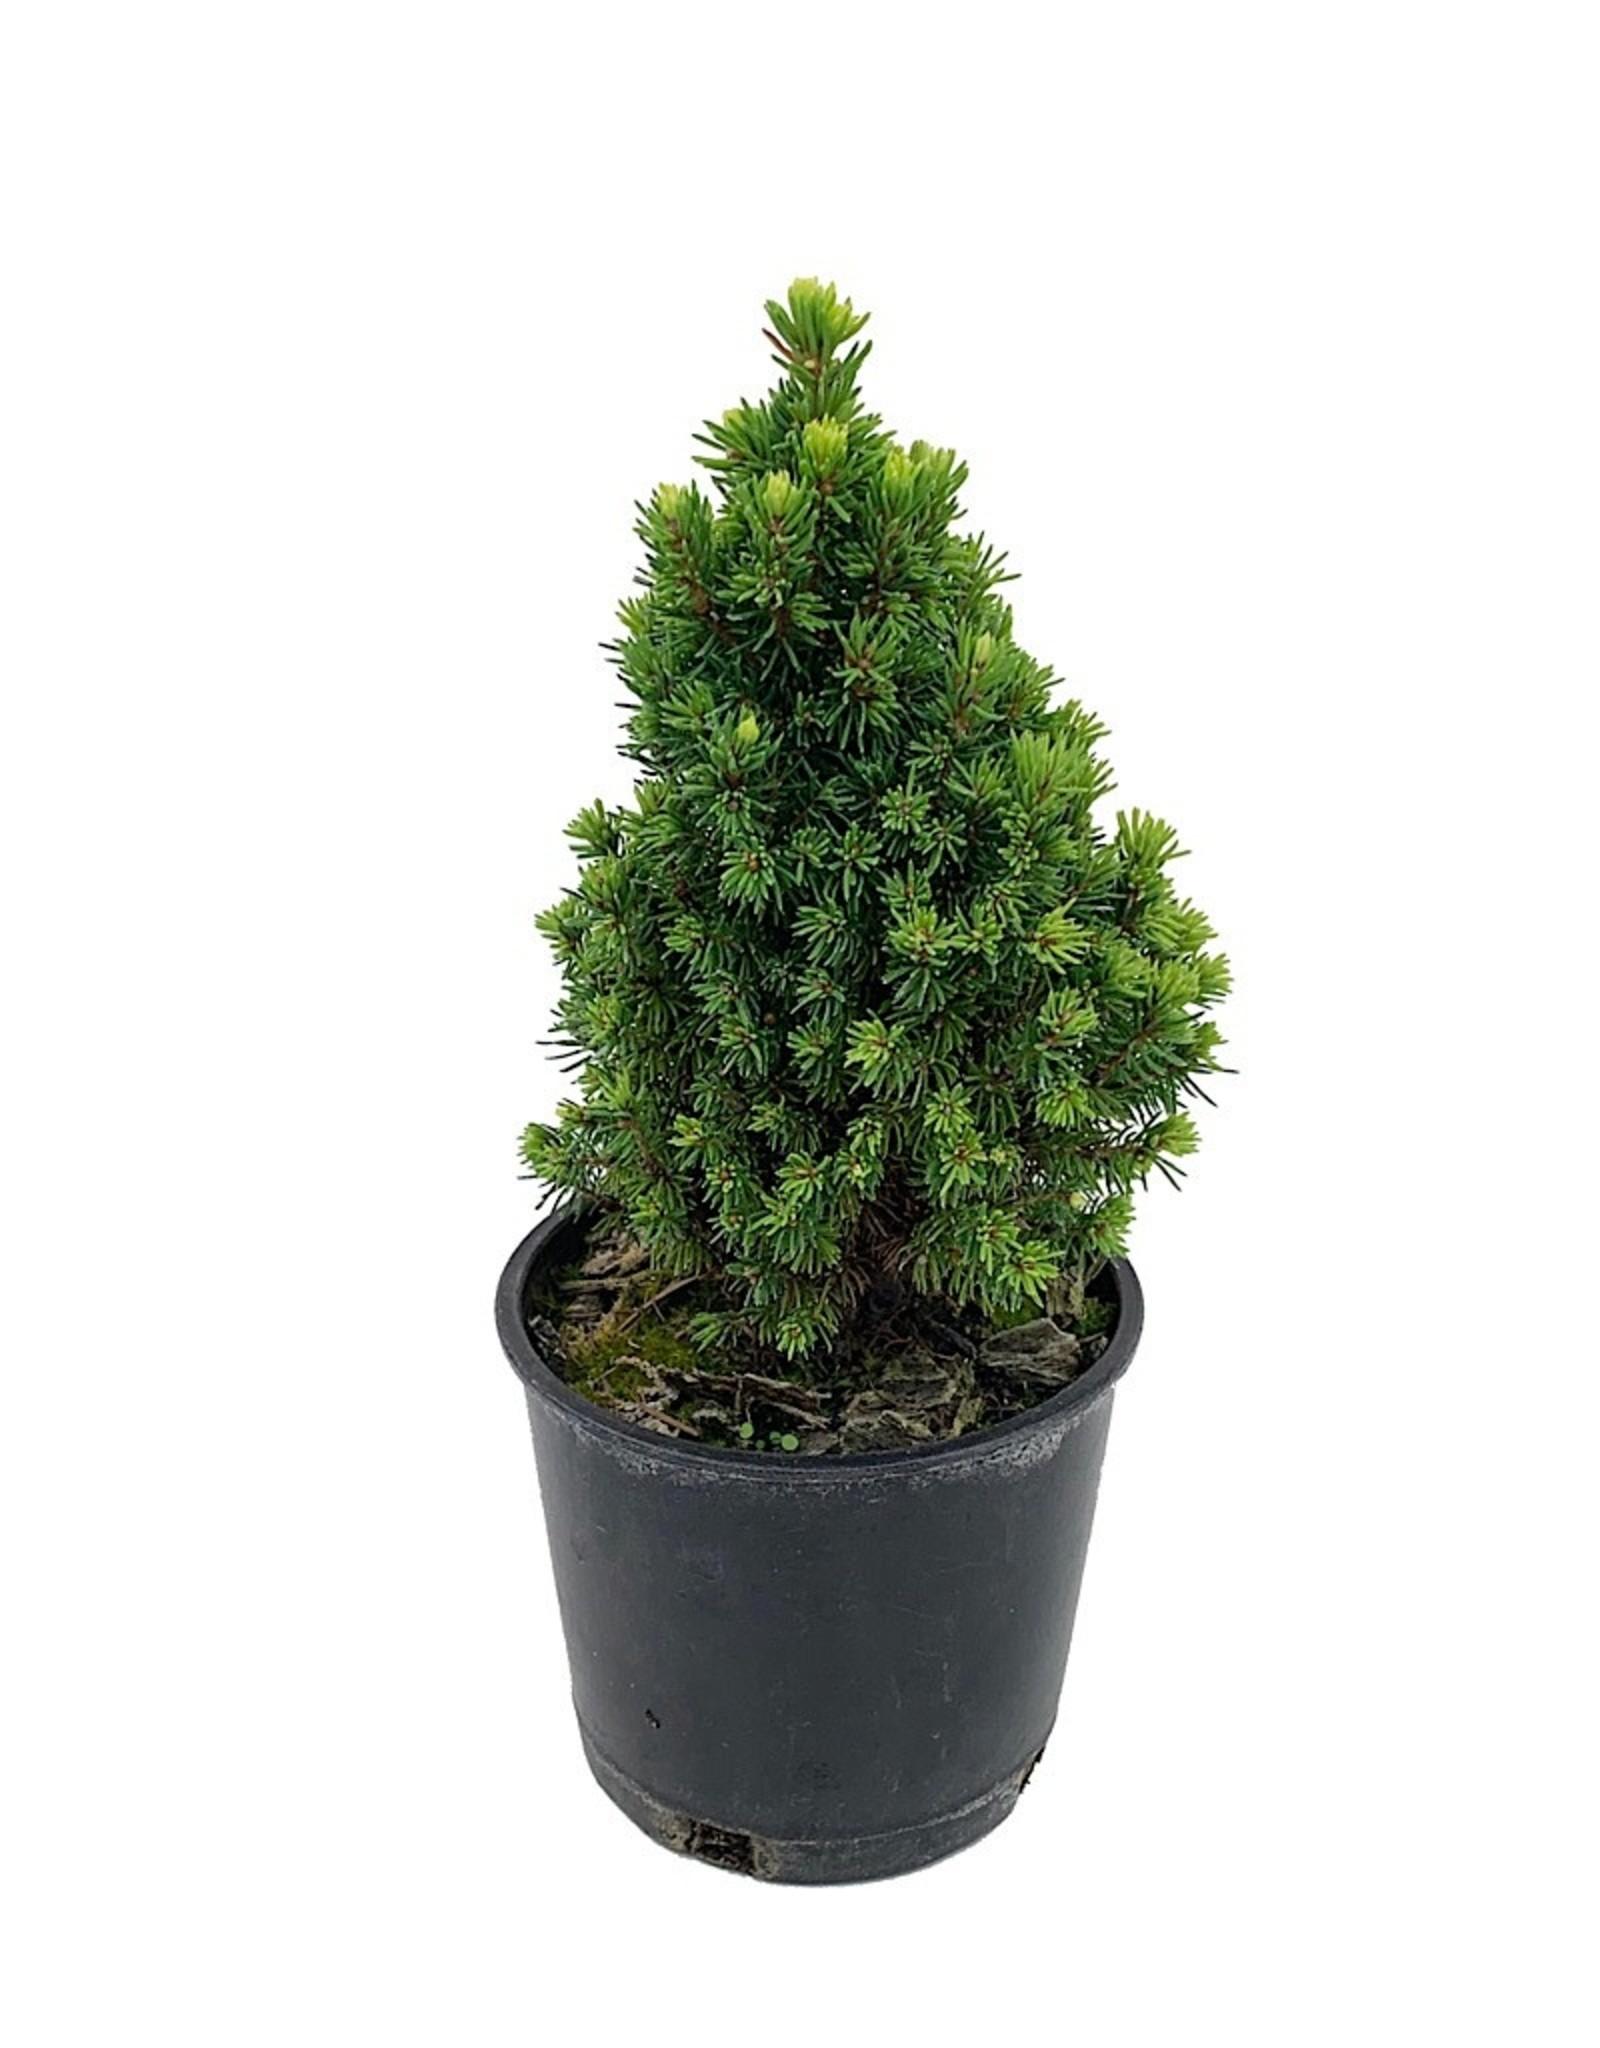 Picea glauca 'Pixie Dust' - 4 inch